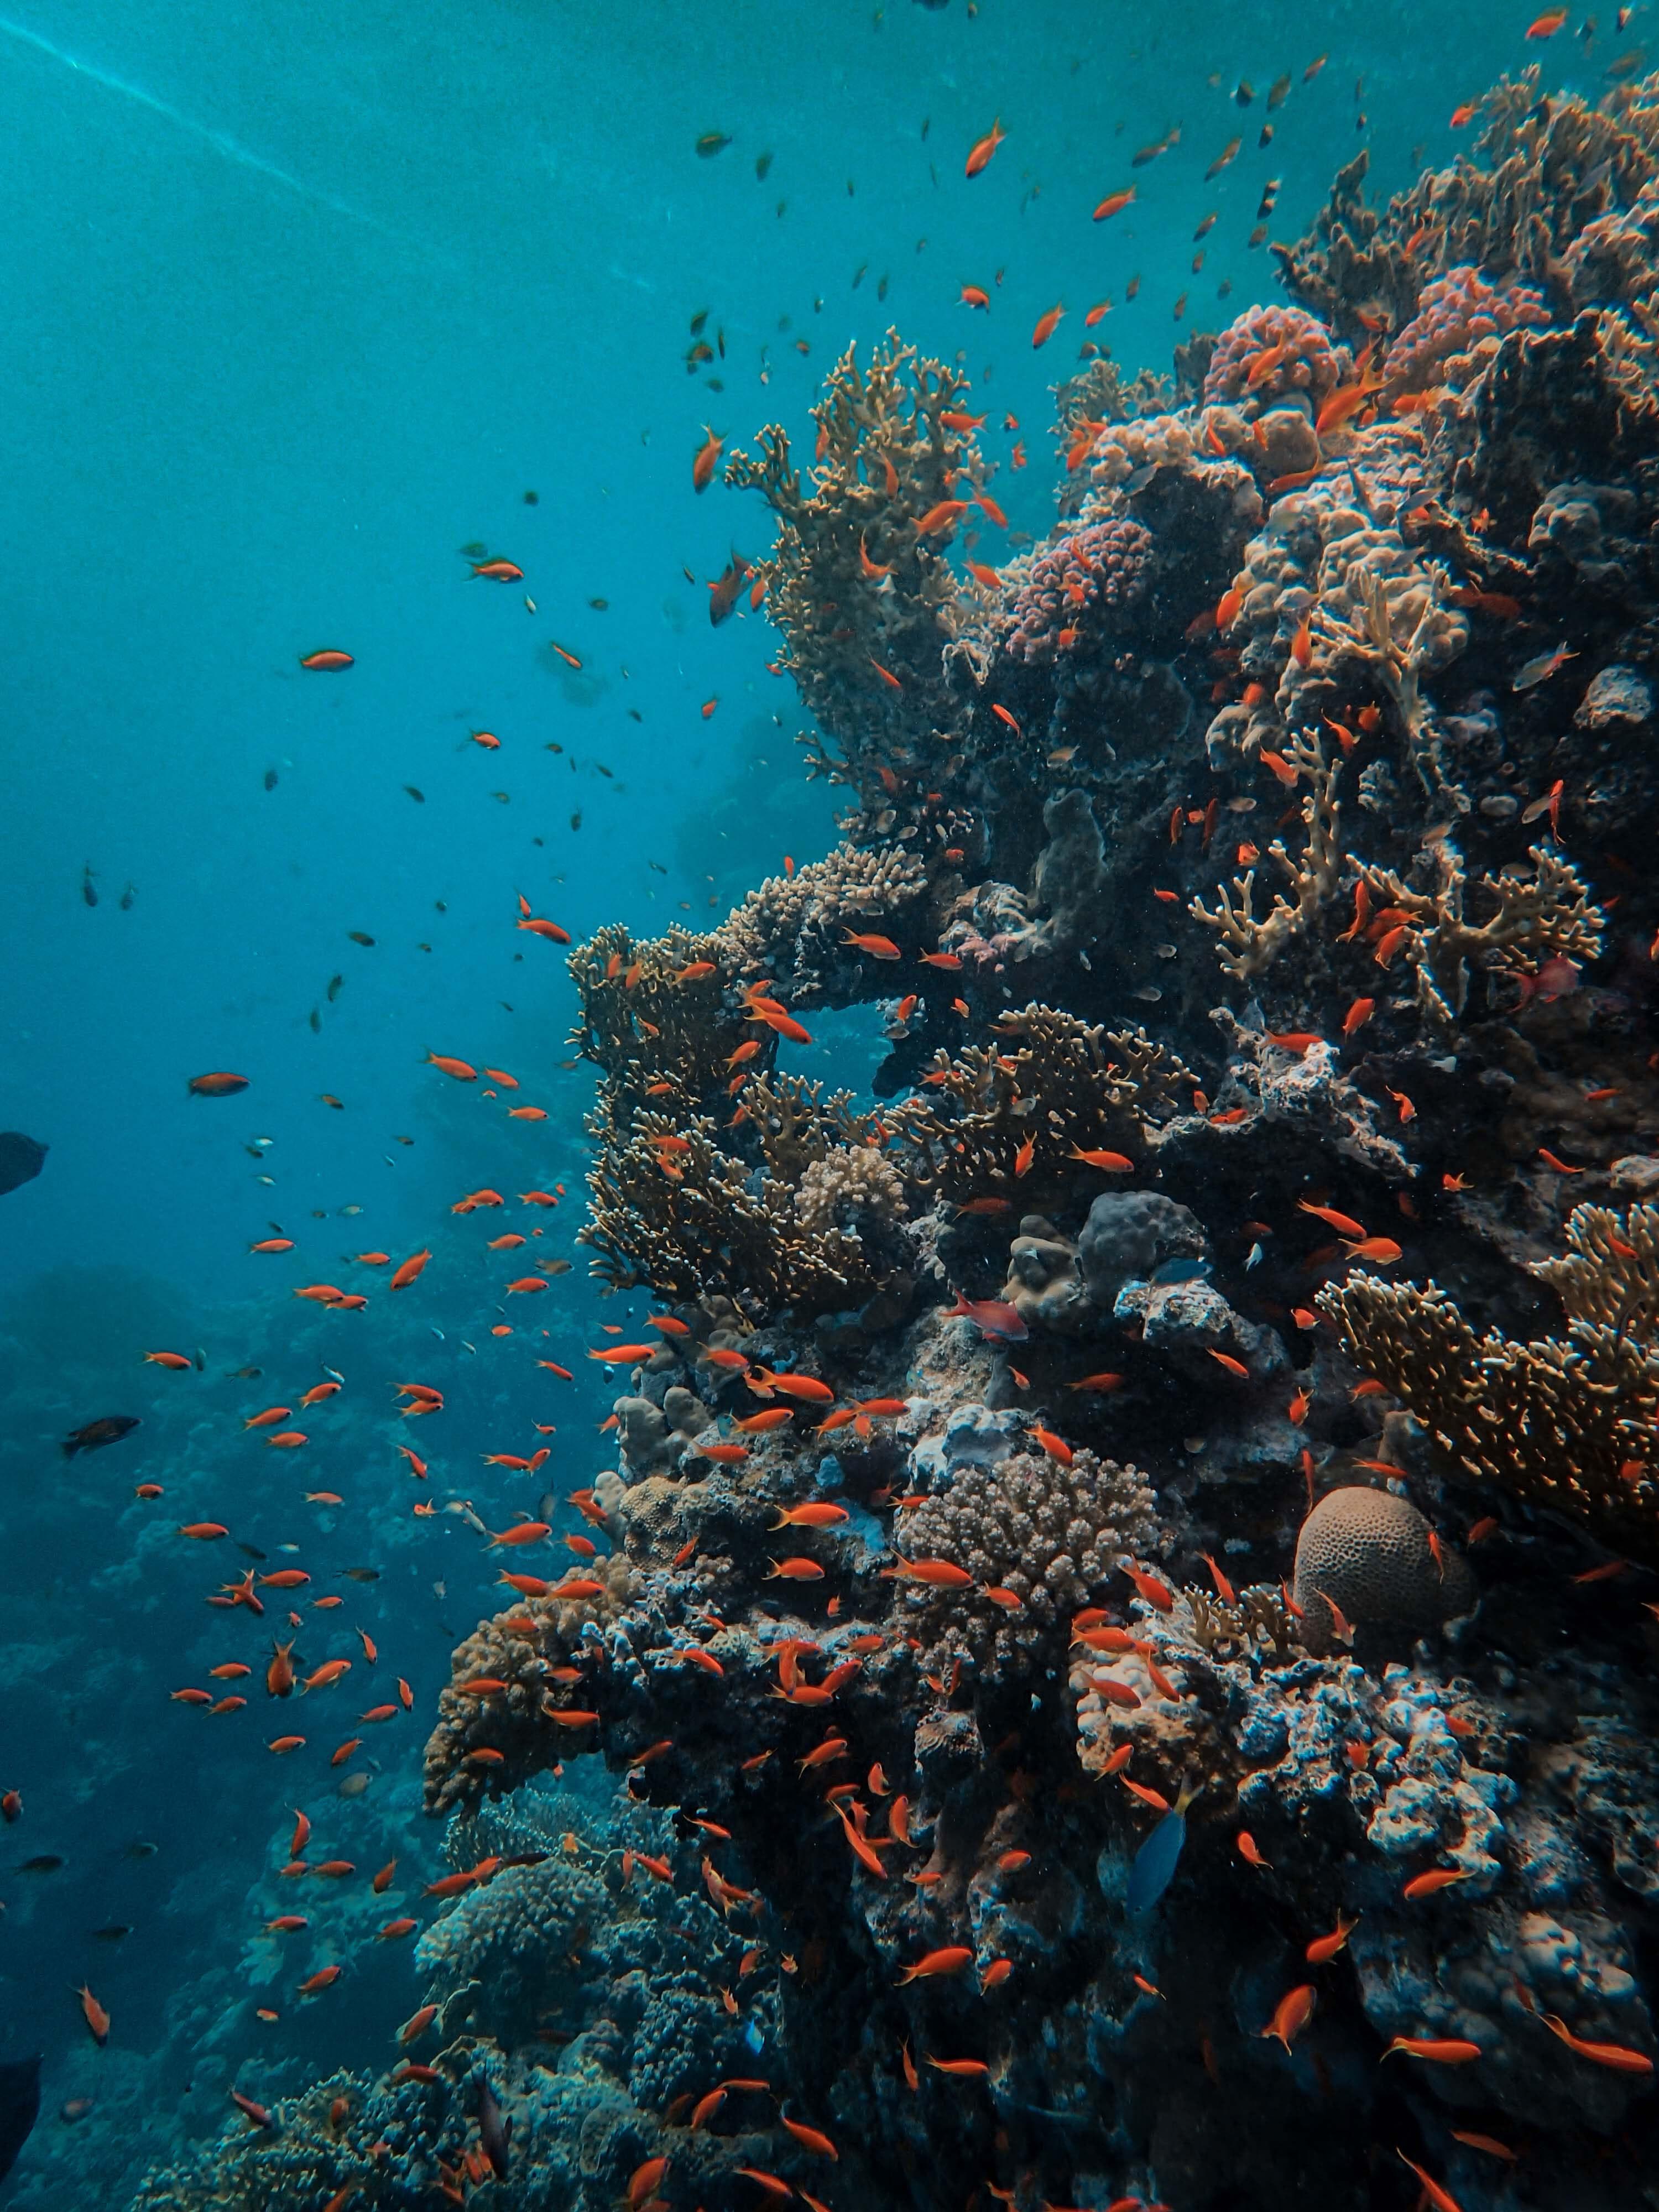 live camera coral reef marine life pacific ocean fish underwater home, rustic, plant, wooden table, terrarium, virtual, localbini, biniblog, ecofriendly